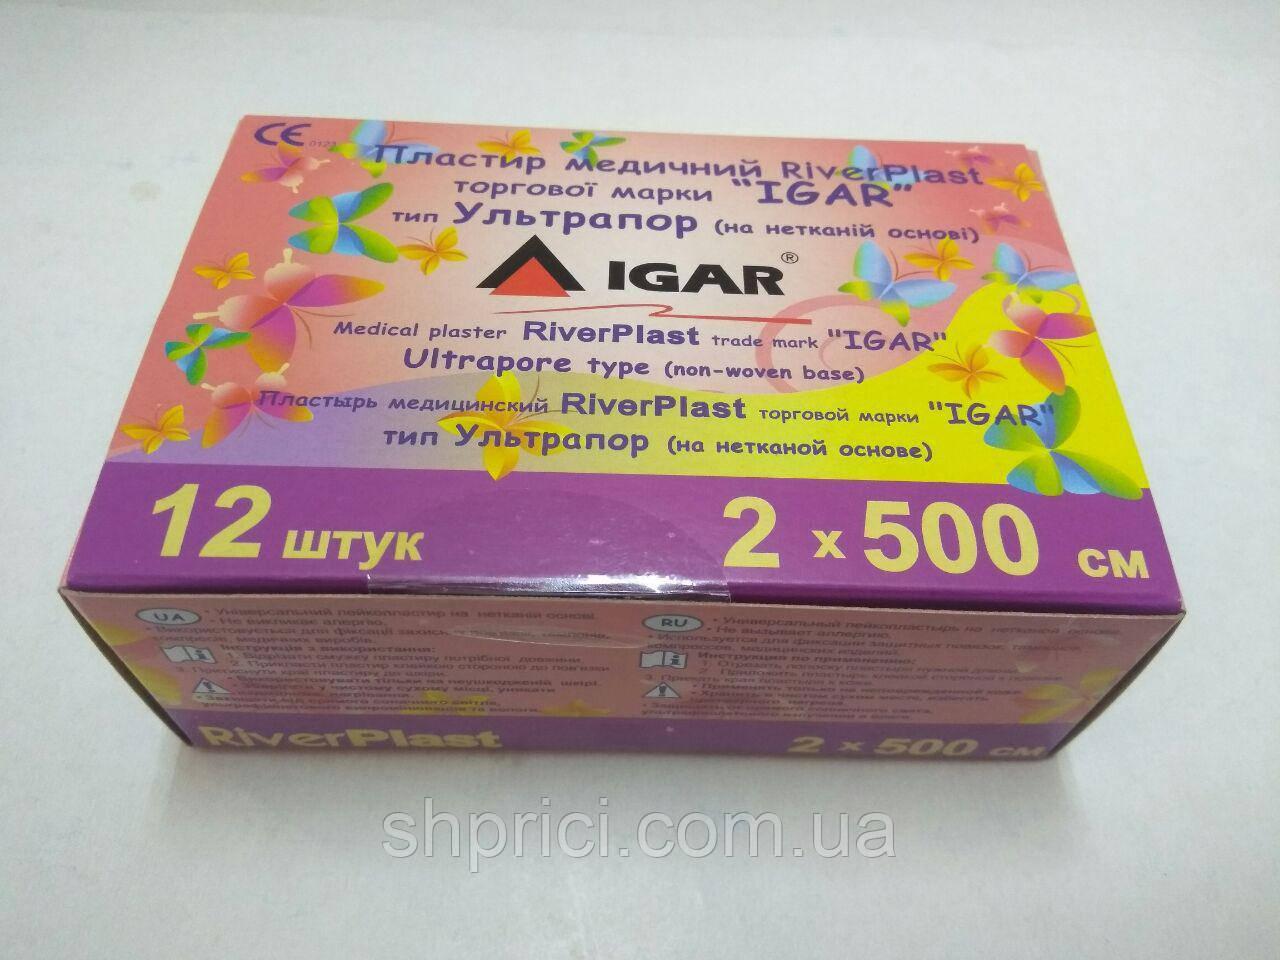 Пластырь медицинский 2х500 см Ультрапор (нетканая основа)/ RiverPlast / ИГАР, 1 шт.